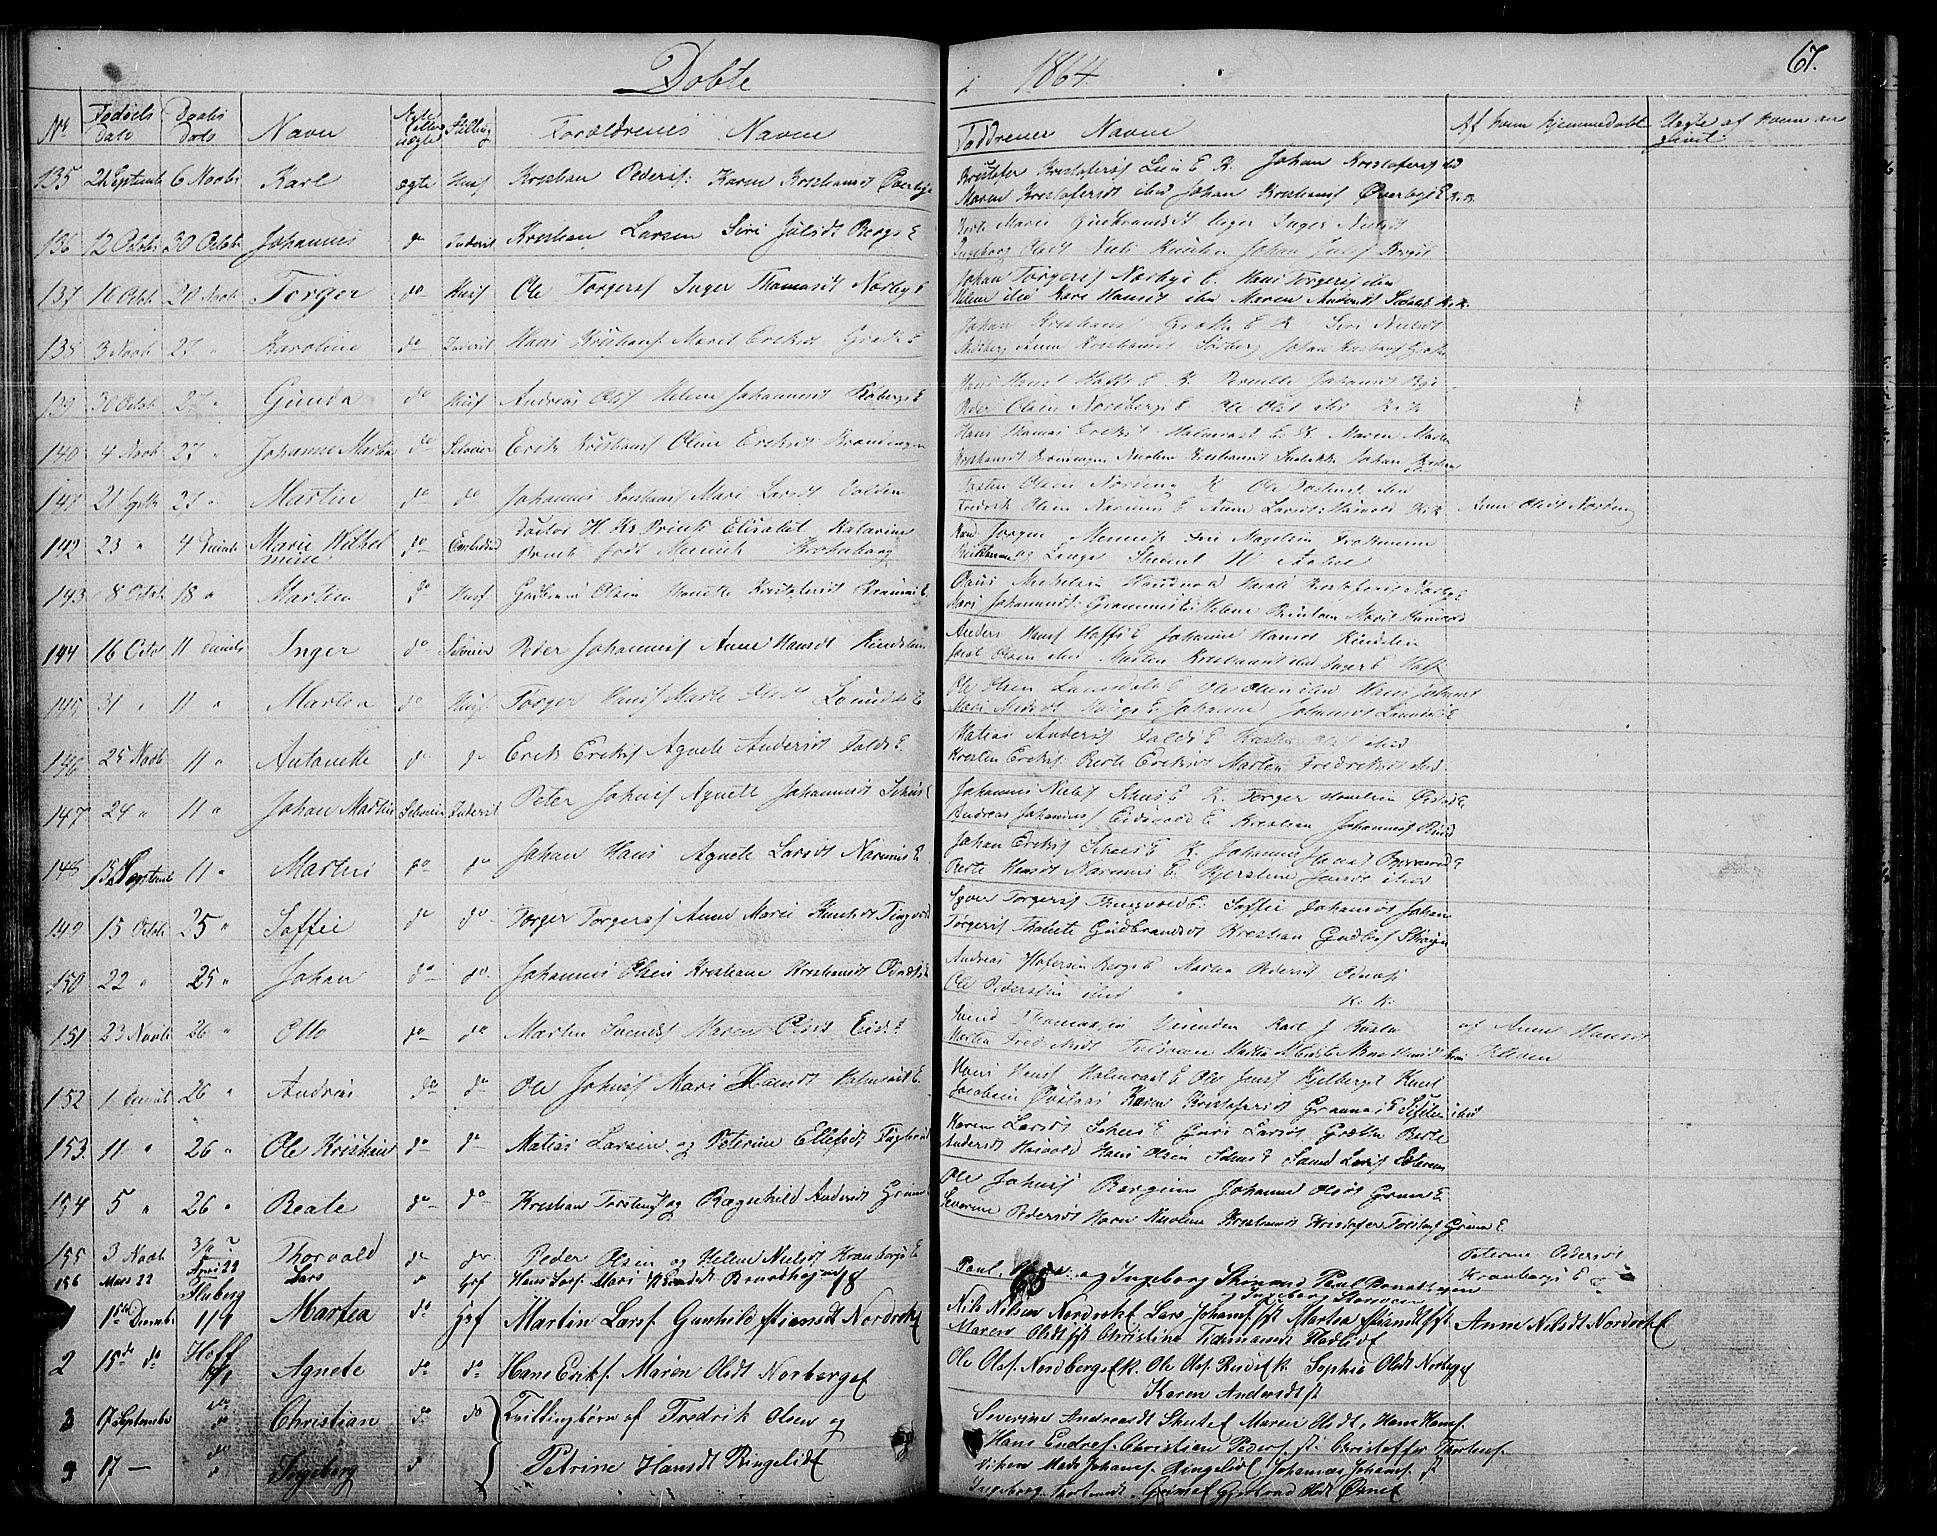 SAH, Søndre Land prestekontor, L/L0001: Klokkerbok nr. 1, 1849-1883, s. 67